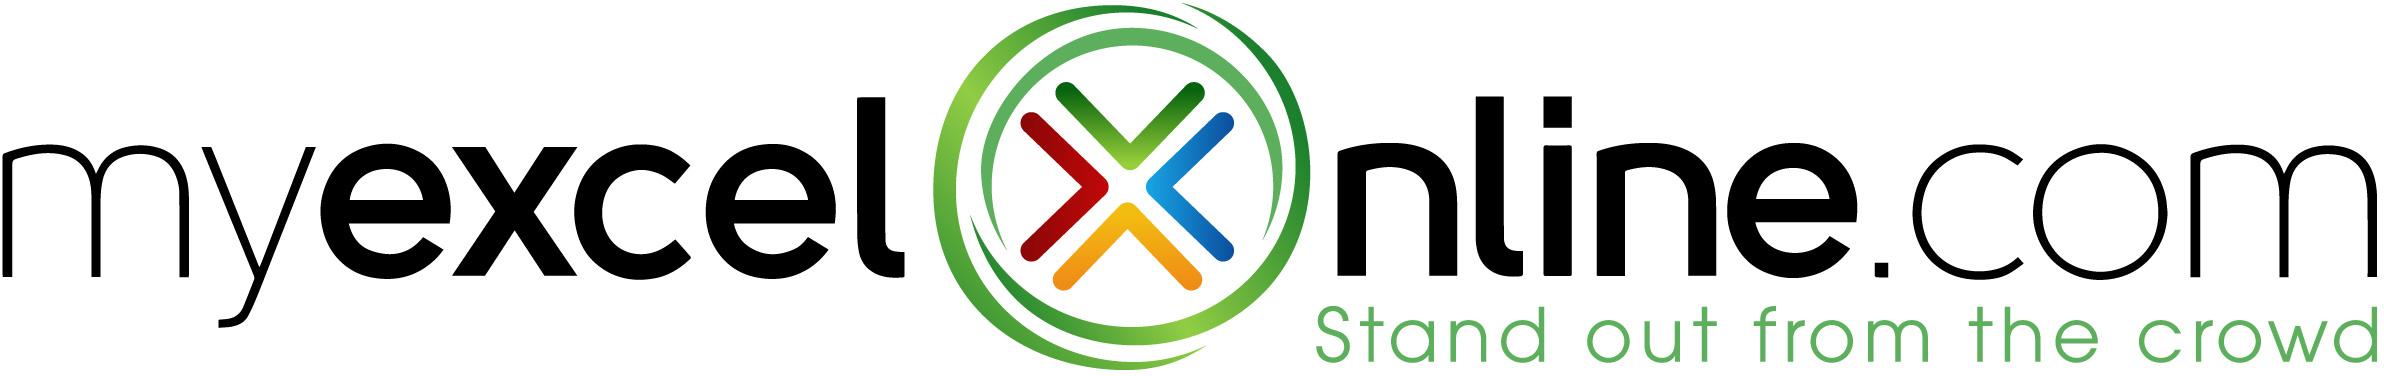 Myexcelonline_logo